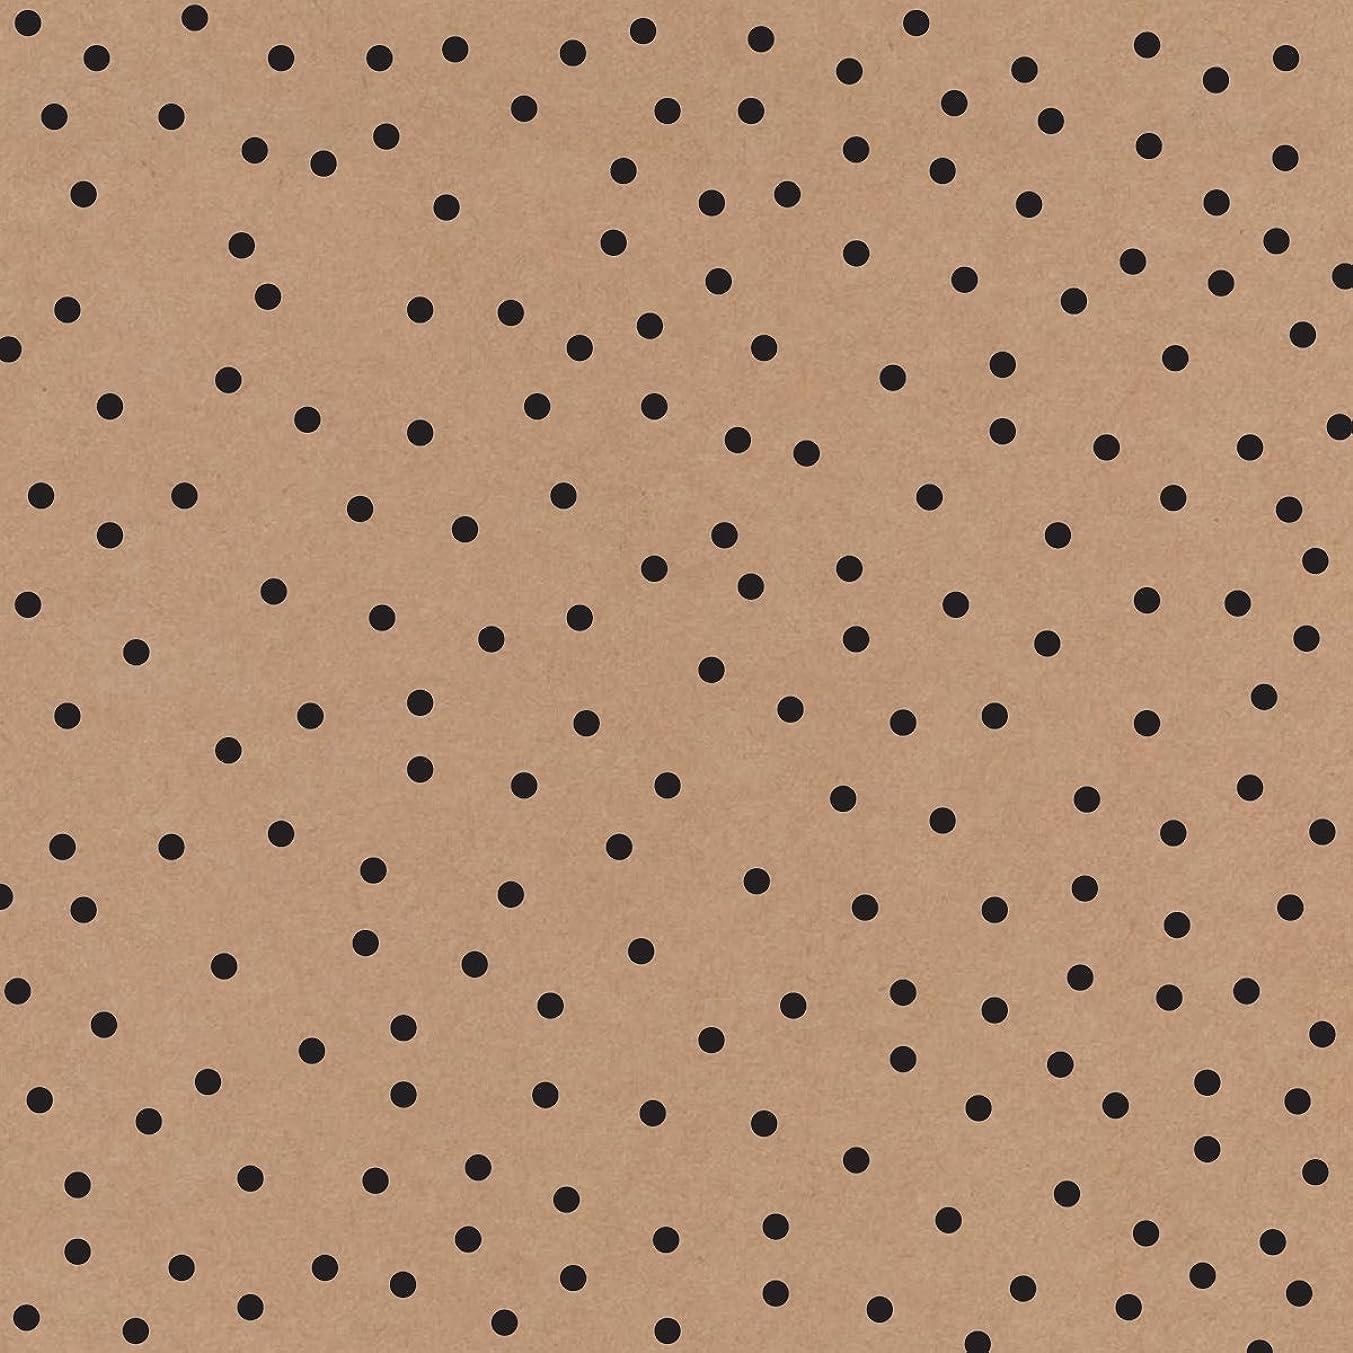 American Crafts 370851 DIY Shop 3 Kraft Cardstock (15 Sheets Per Pack), 12